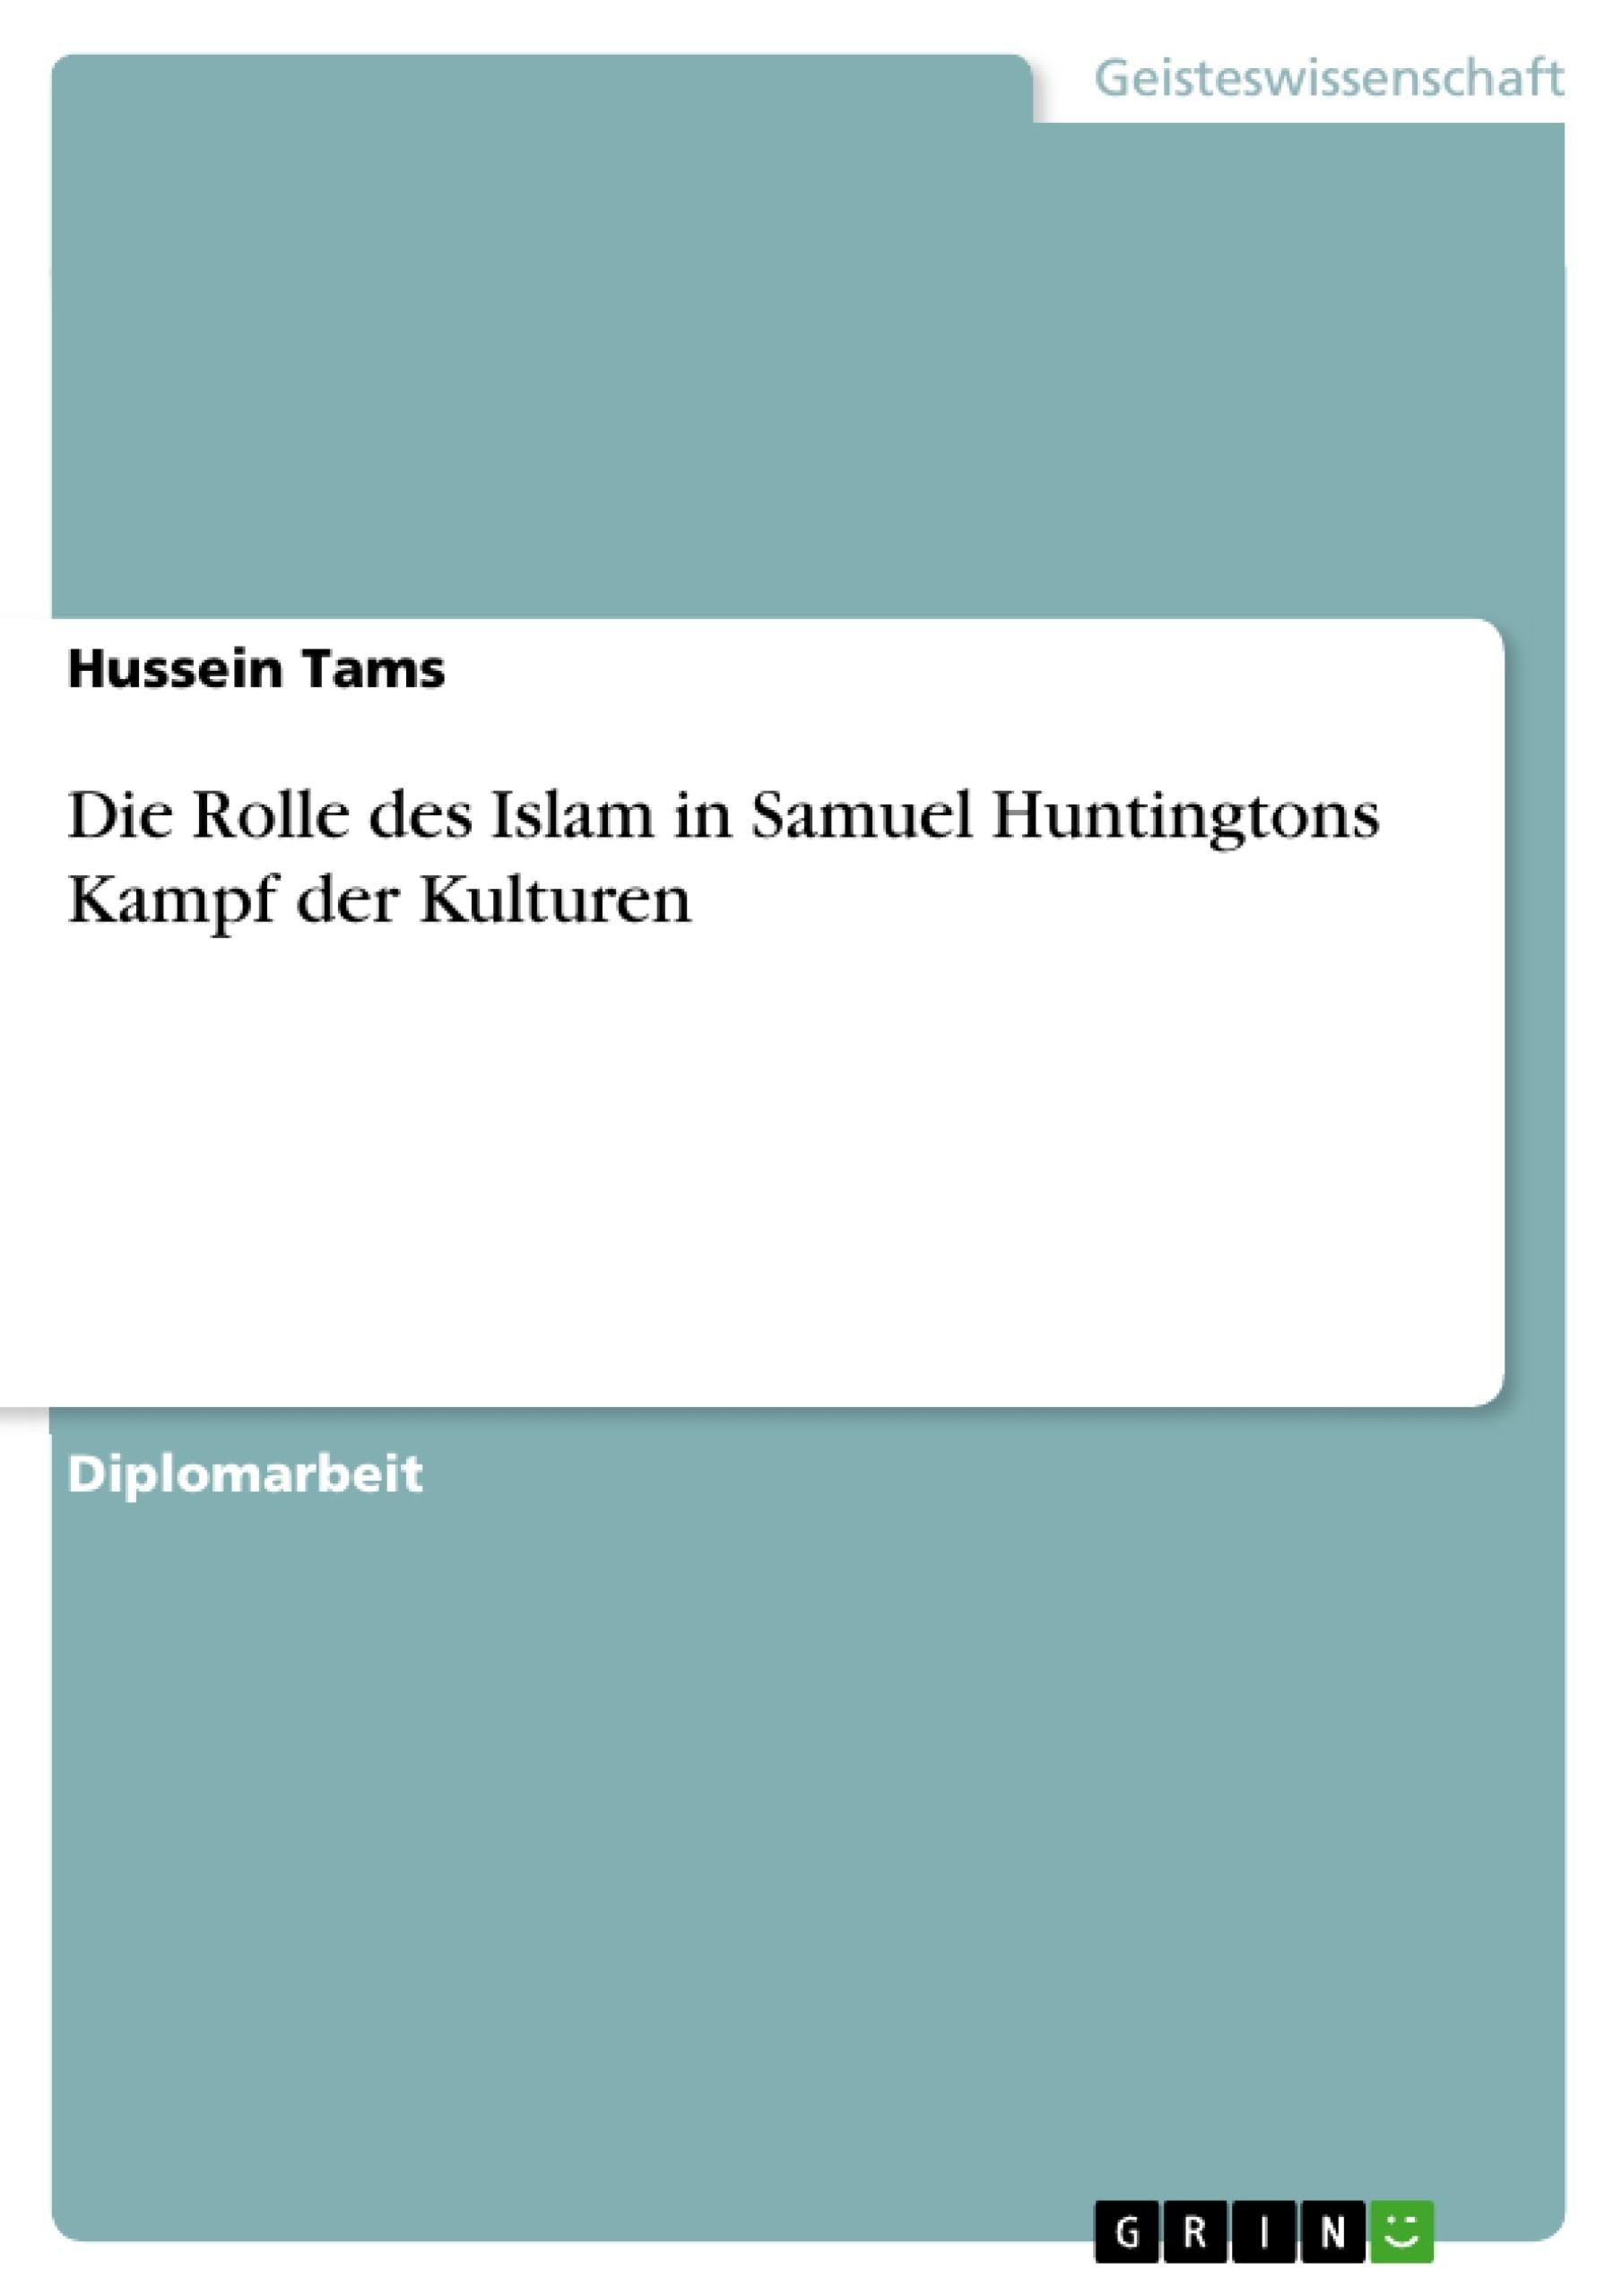 Titel: Die Rolle des Islam in Samuel Huntingtons  Kampf der Kulturen